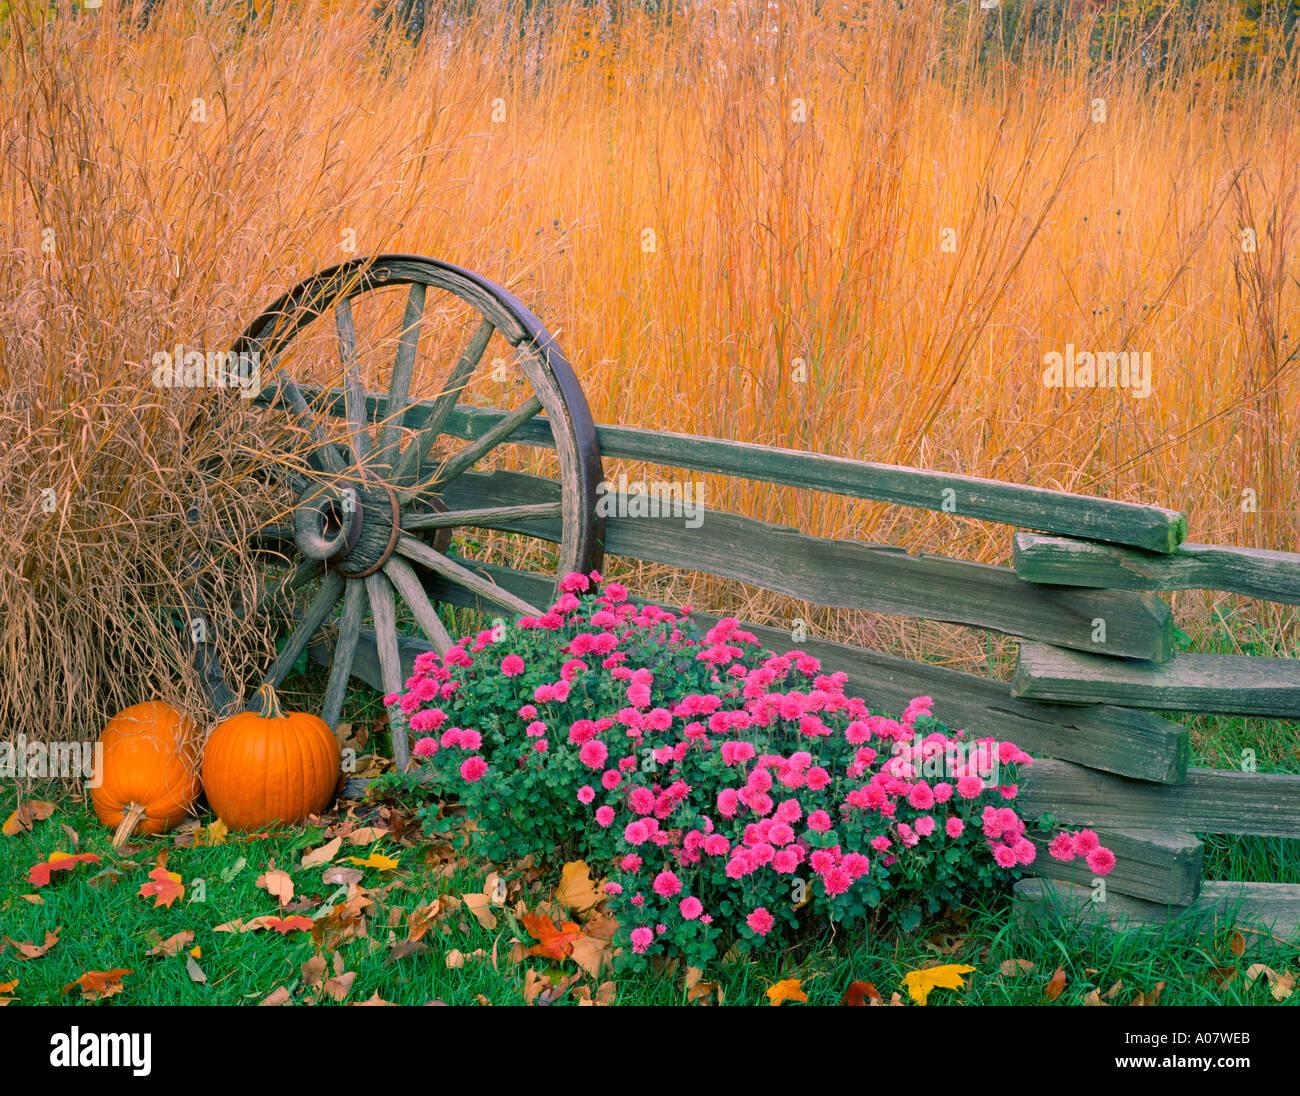 Illinois bureau county princeton - Bureau County Il Fall Scene Of Native Praire Grasses Pumpkins Chrysantheums With Weathered Fence Wagon Wheel